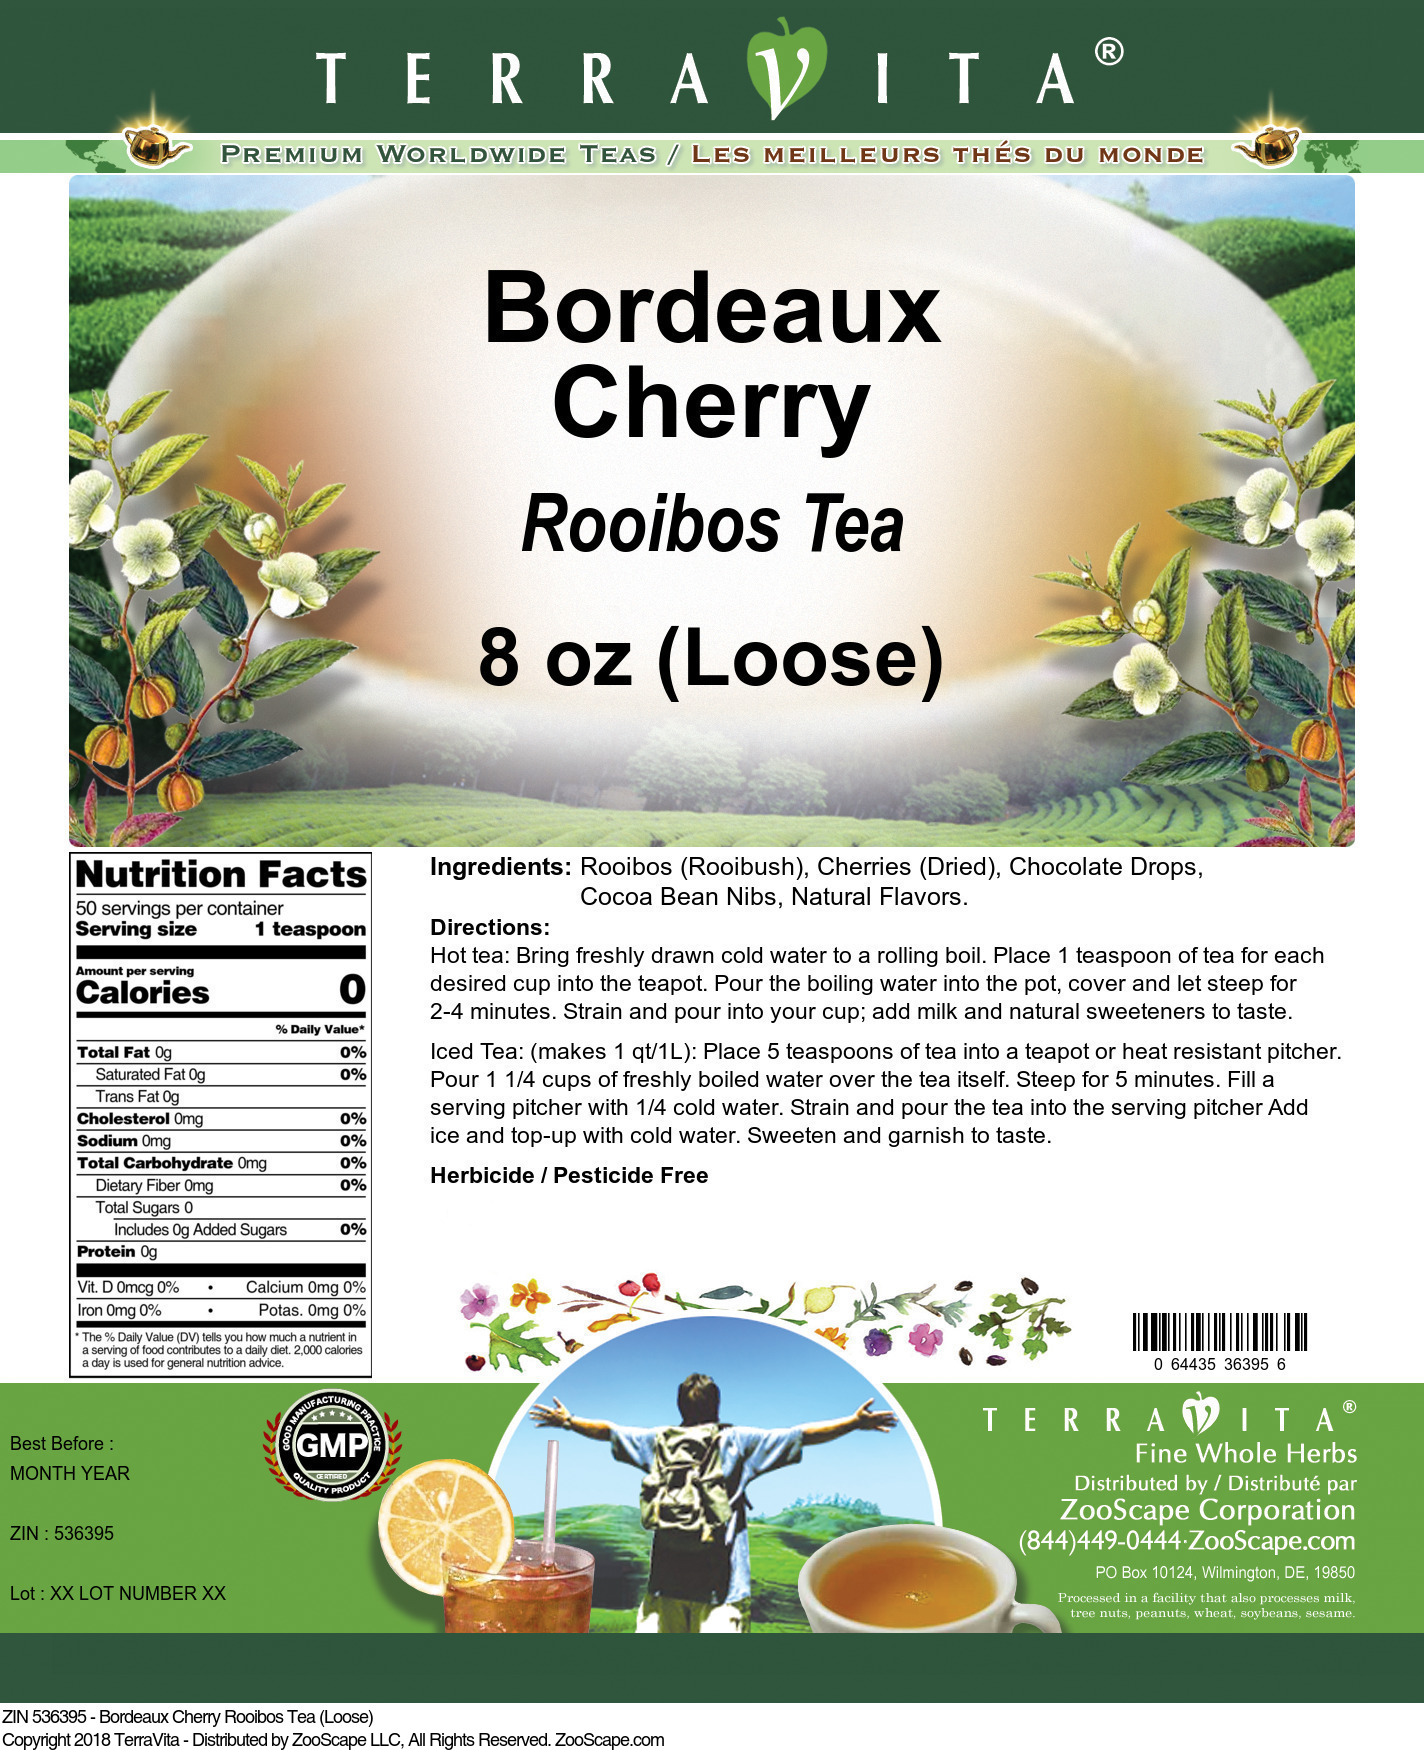 Bordeaux Cherry Rooibos Tea (Loose)